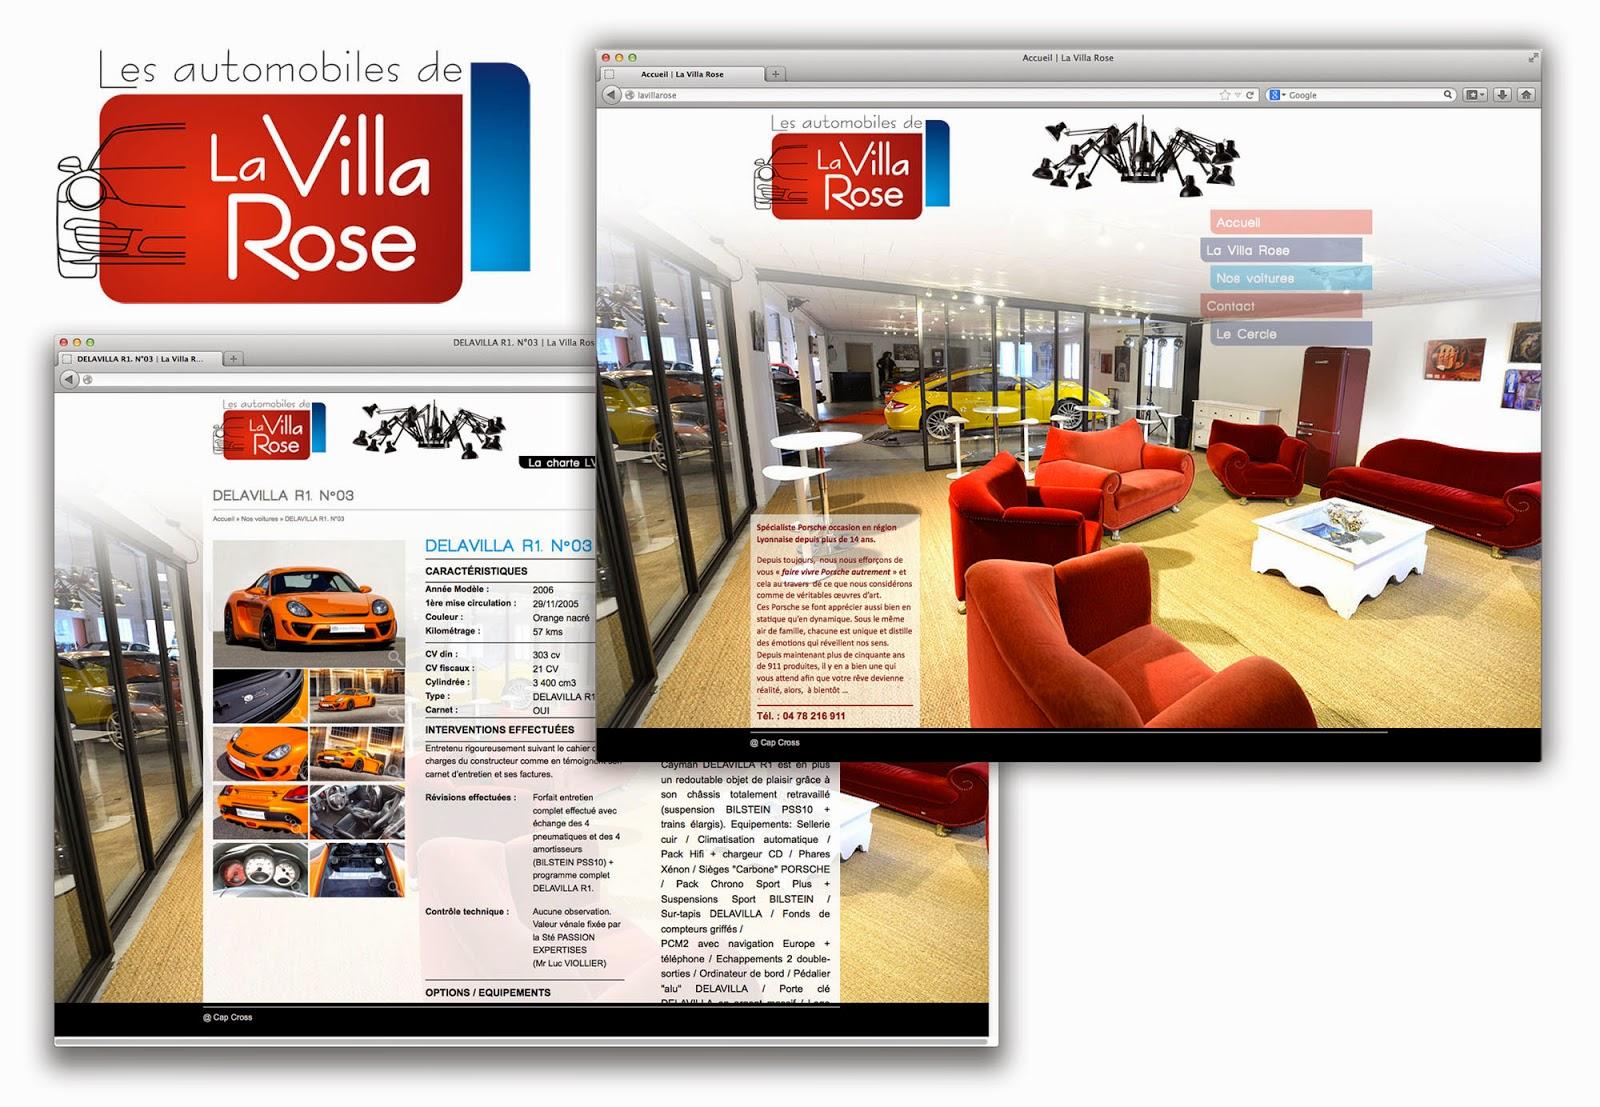 cap cross la villa rose sp cialiste porsche. Black Bedroom Furniture Sets. Home Design Ideas